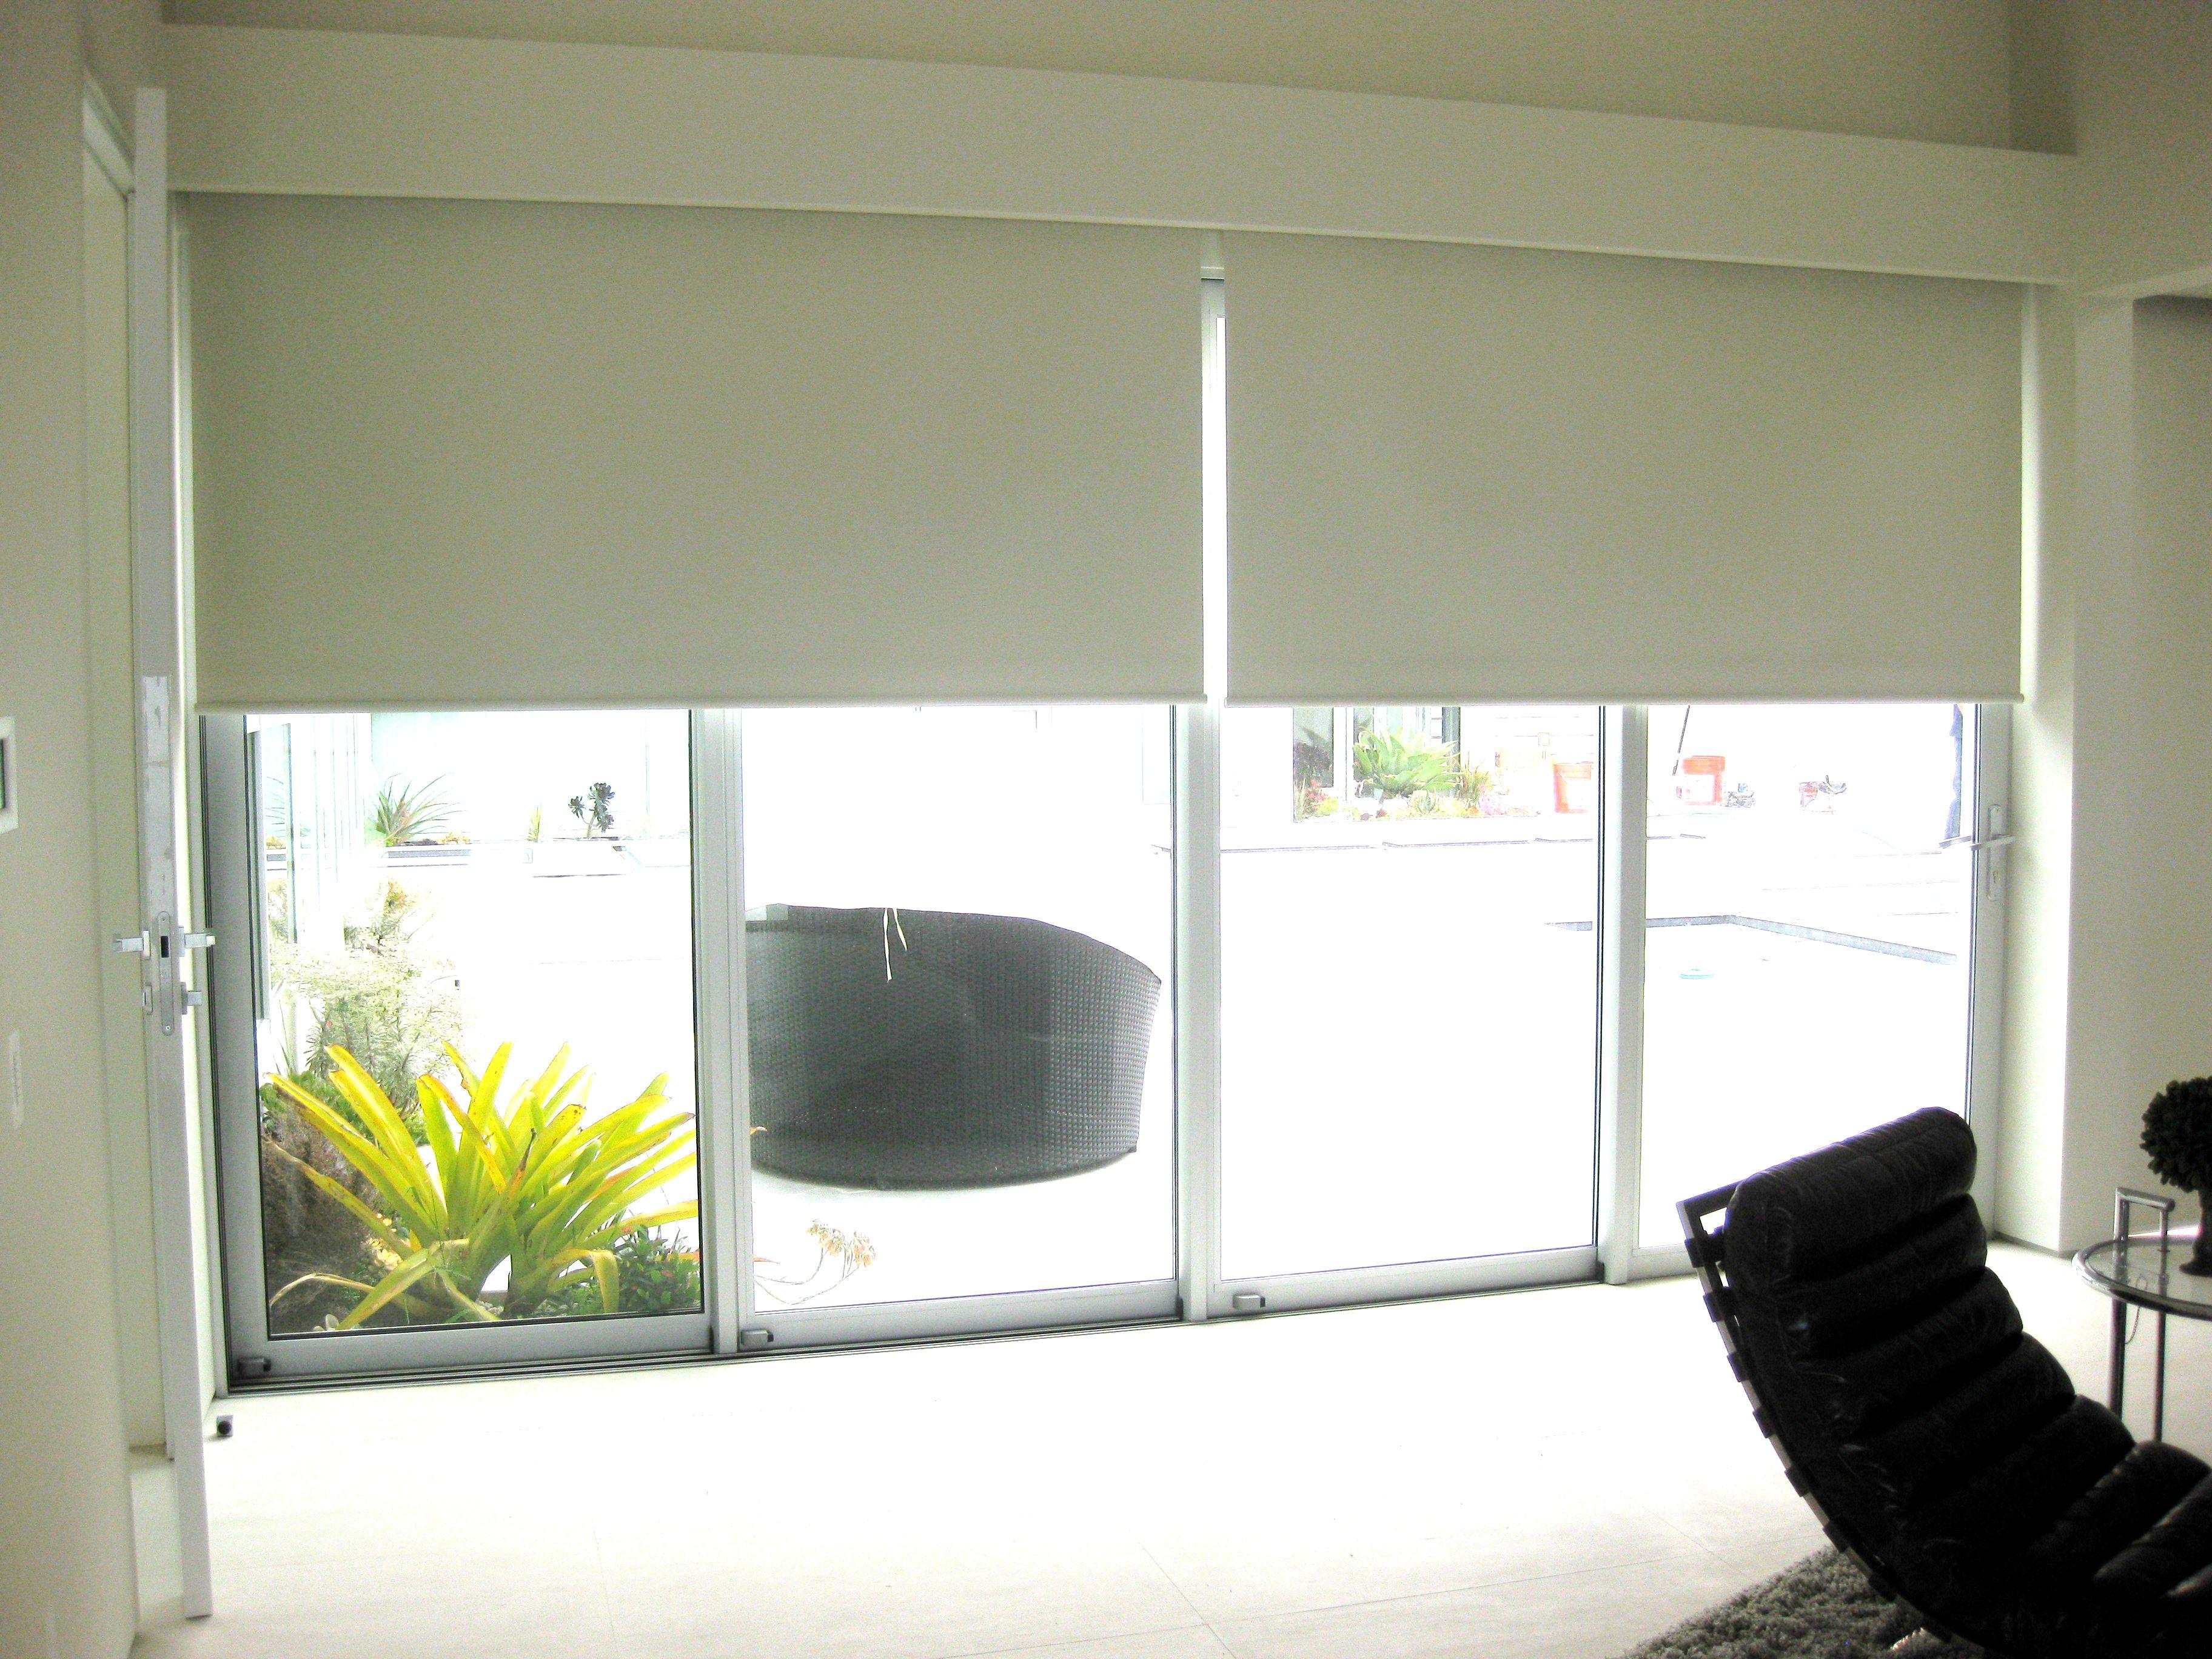 OC Window Shades Blackout Roller Shades